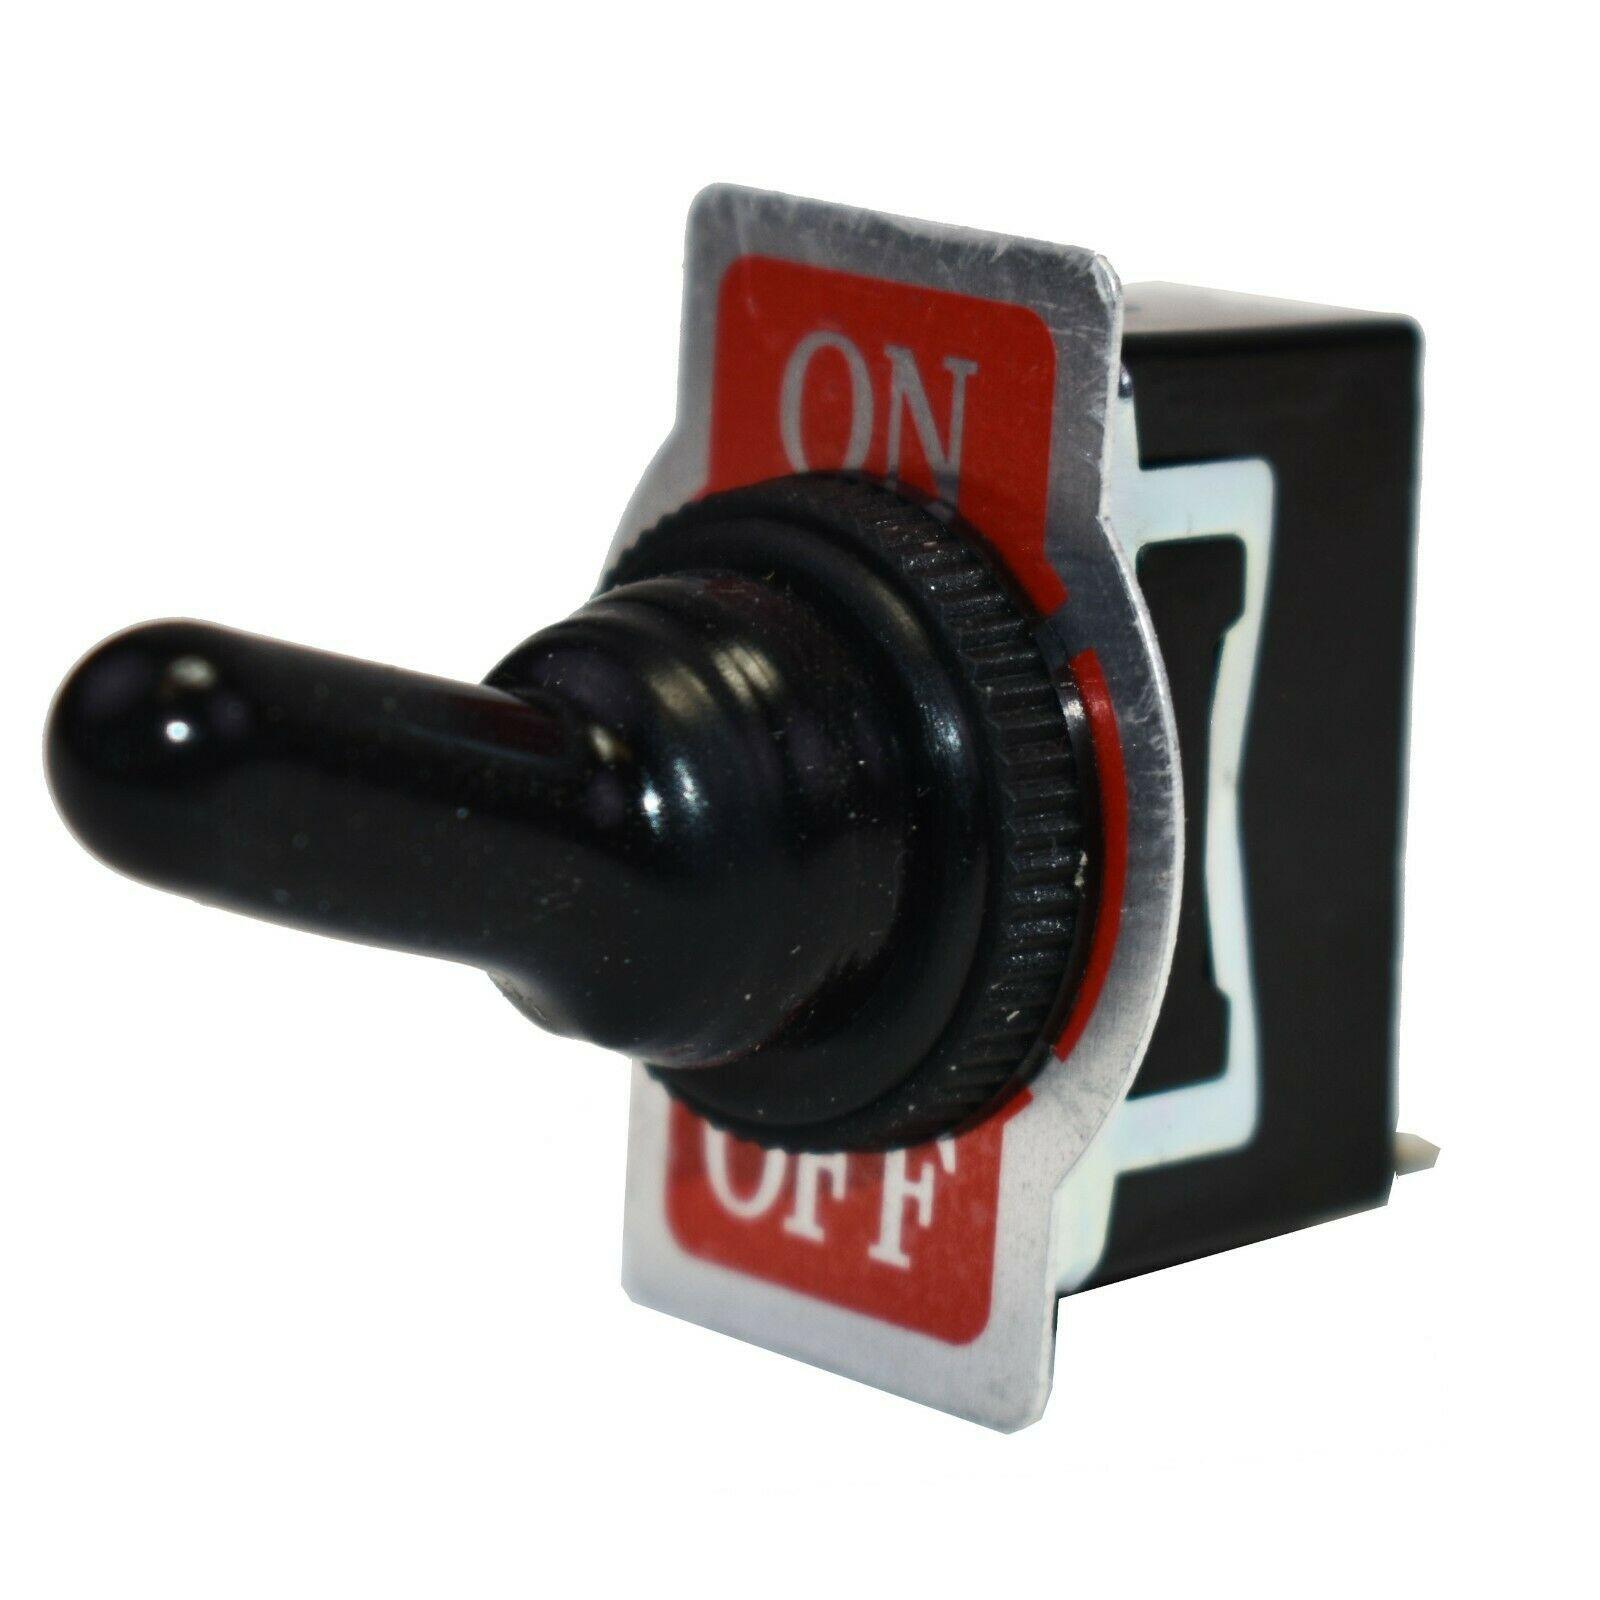 SPST ON-Off Heavy Duty 20 Amp AC/DC Toggle Switch w/ Weatherproof Neoprene Boot